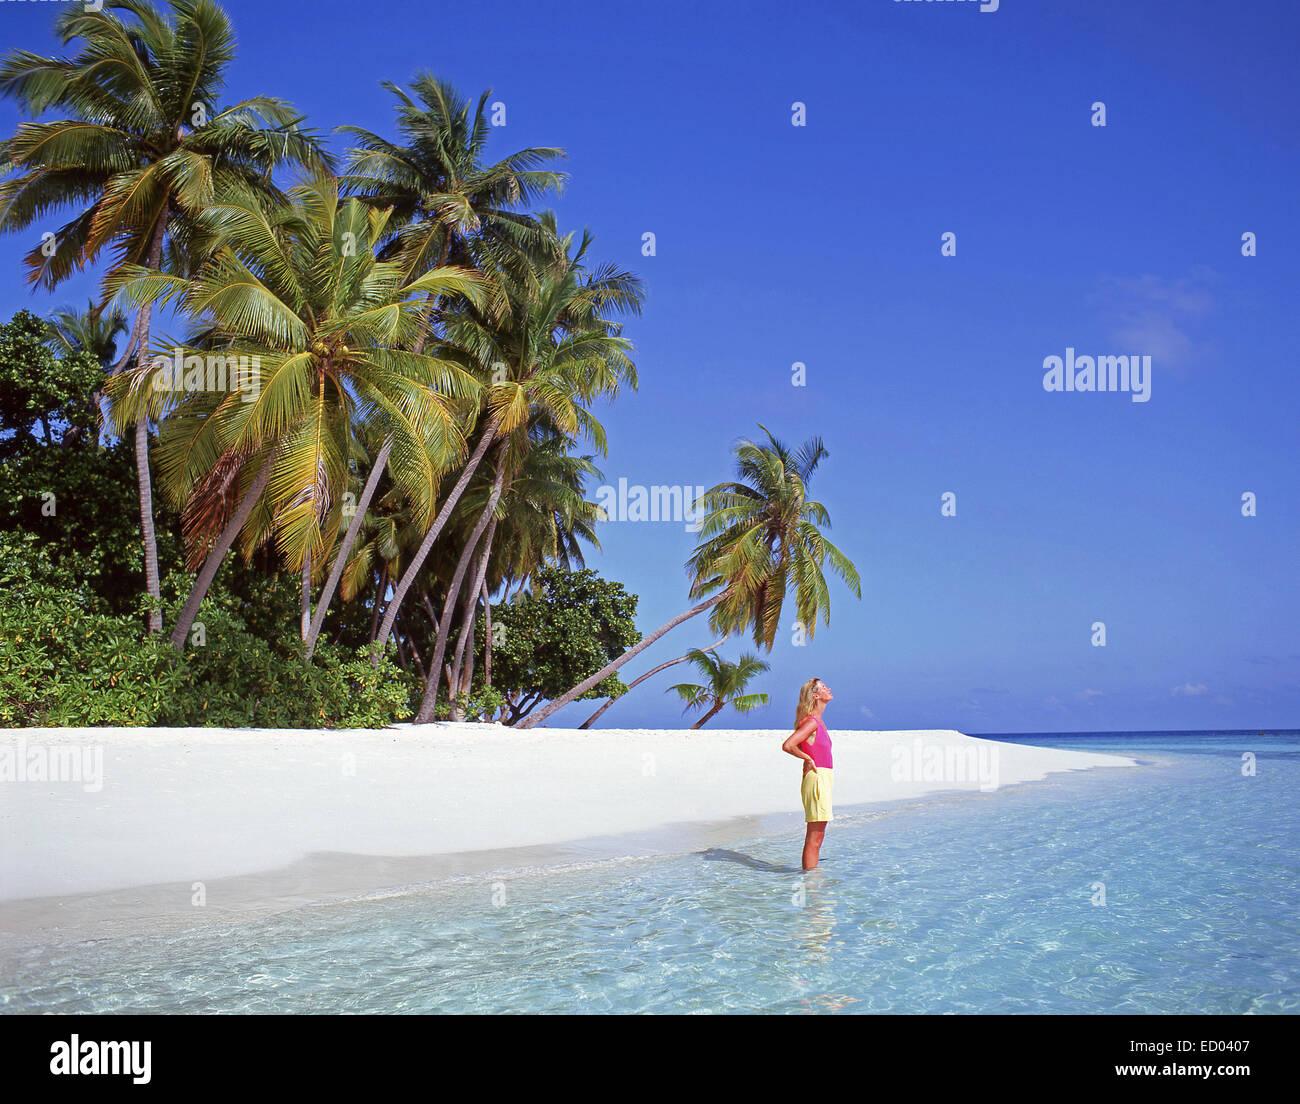 Young woman on tropical beach, Kuda Bandos Island, Kaafu Atoll, Republic of Maldives Stock Photo